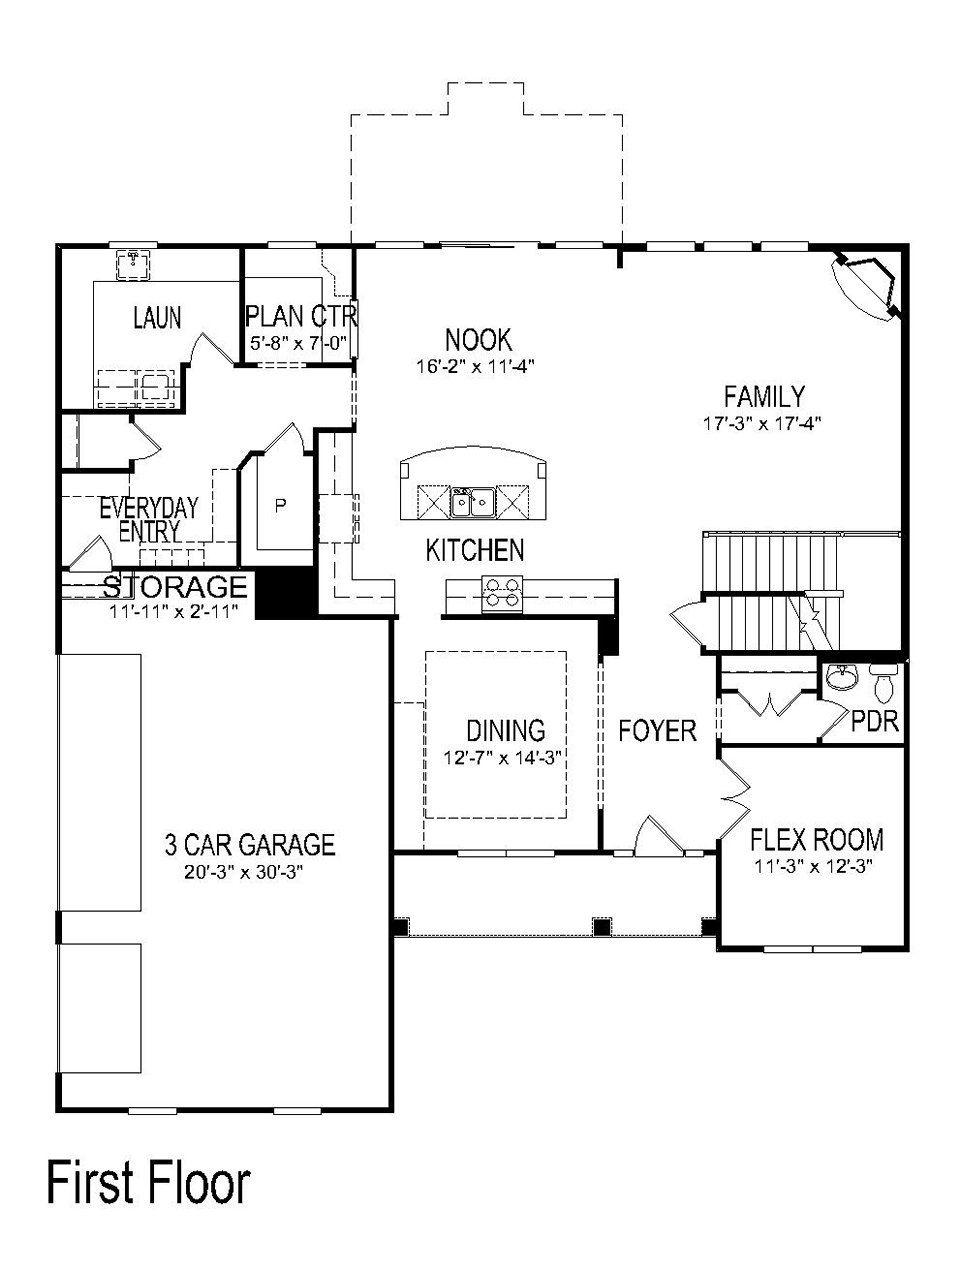 Pulte Homes - Plan Menu   houses   Pinterest   House